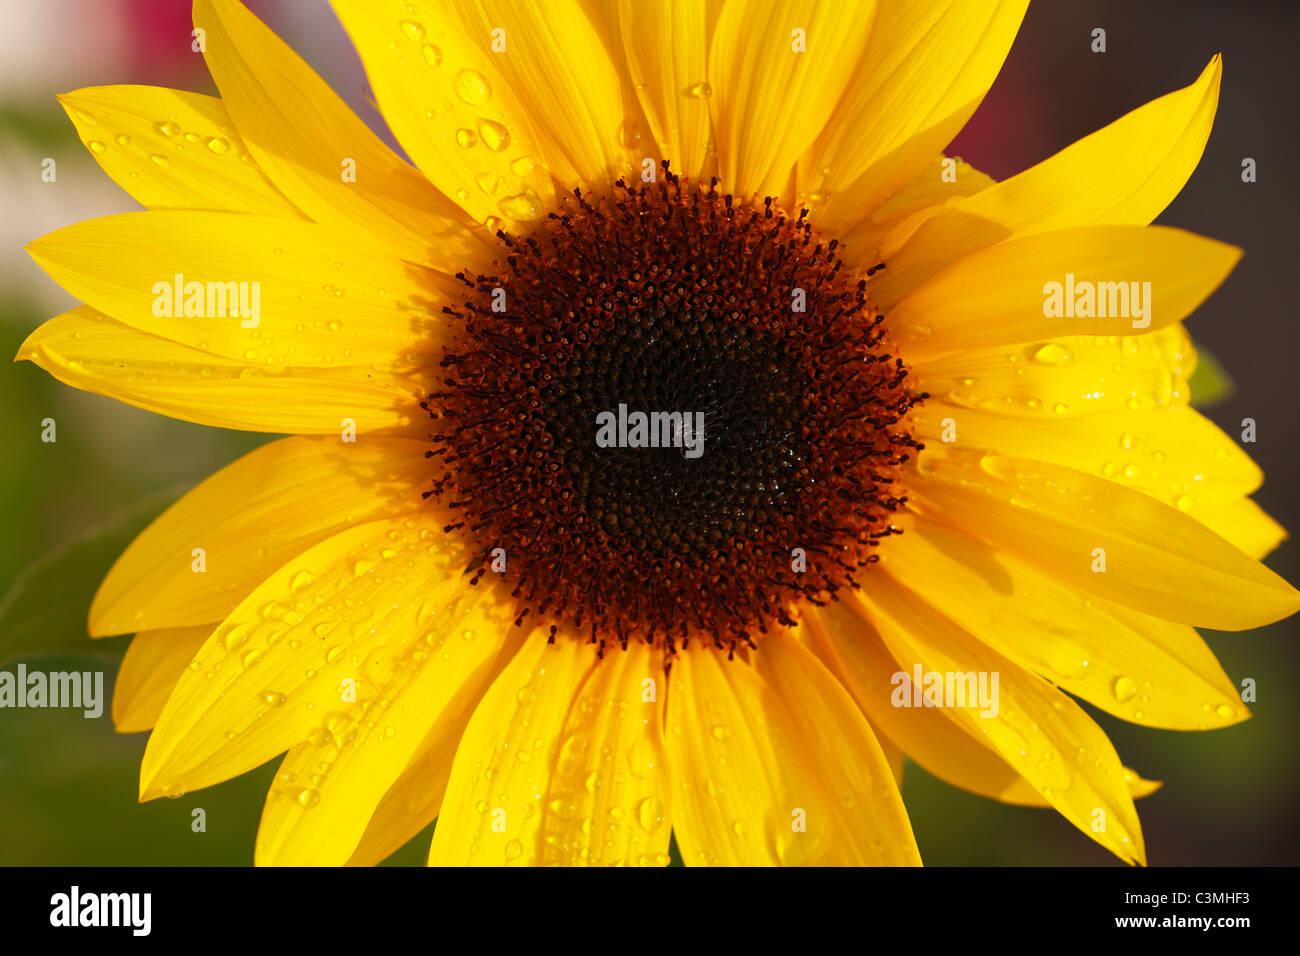 Deutschland, Bayern, Sonnenblume, Nahaufnahme Stockbild